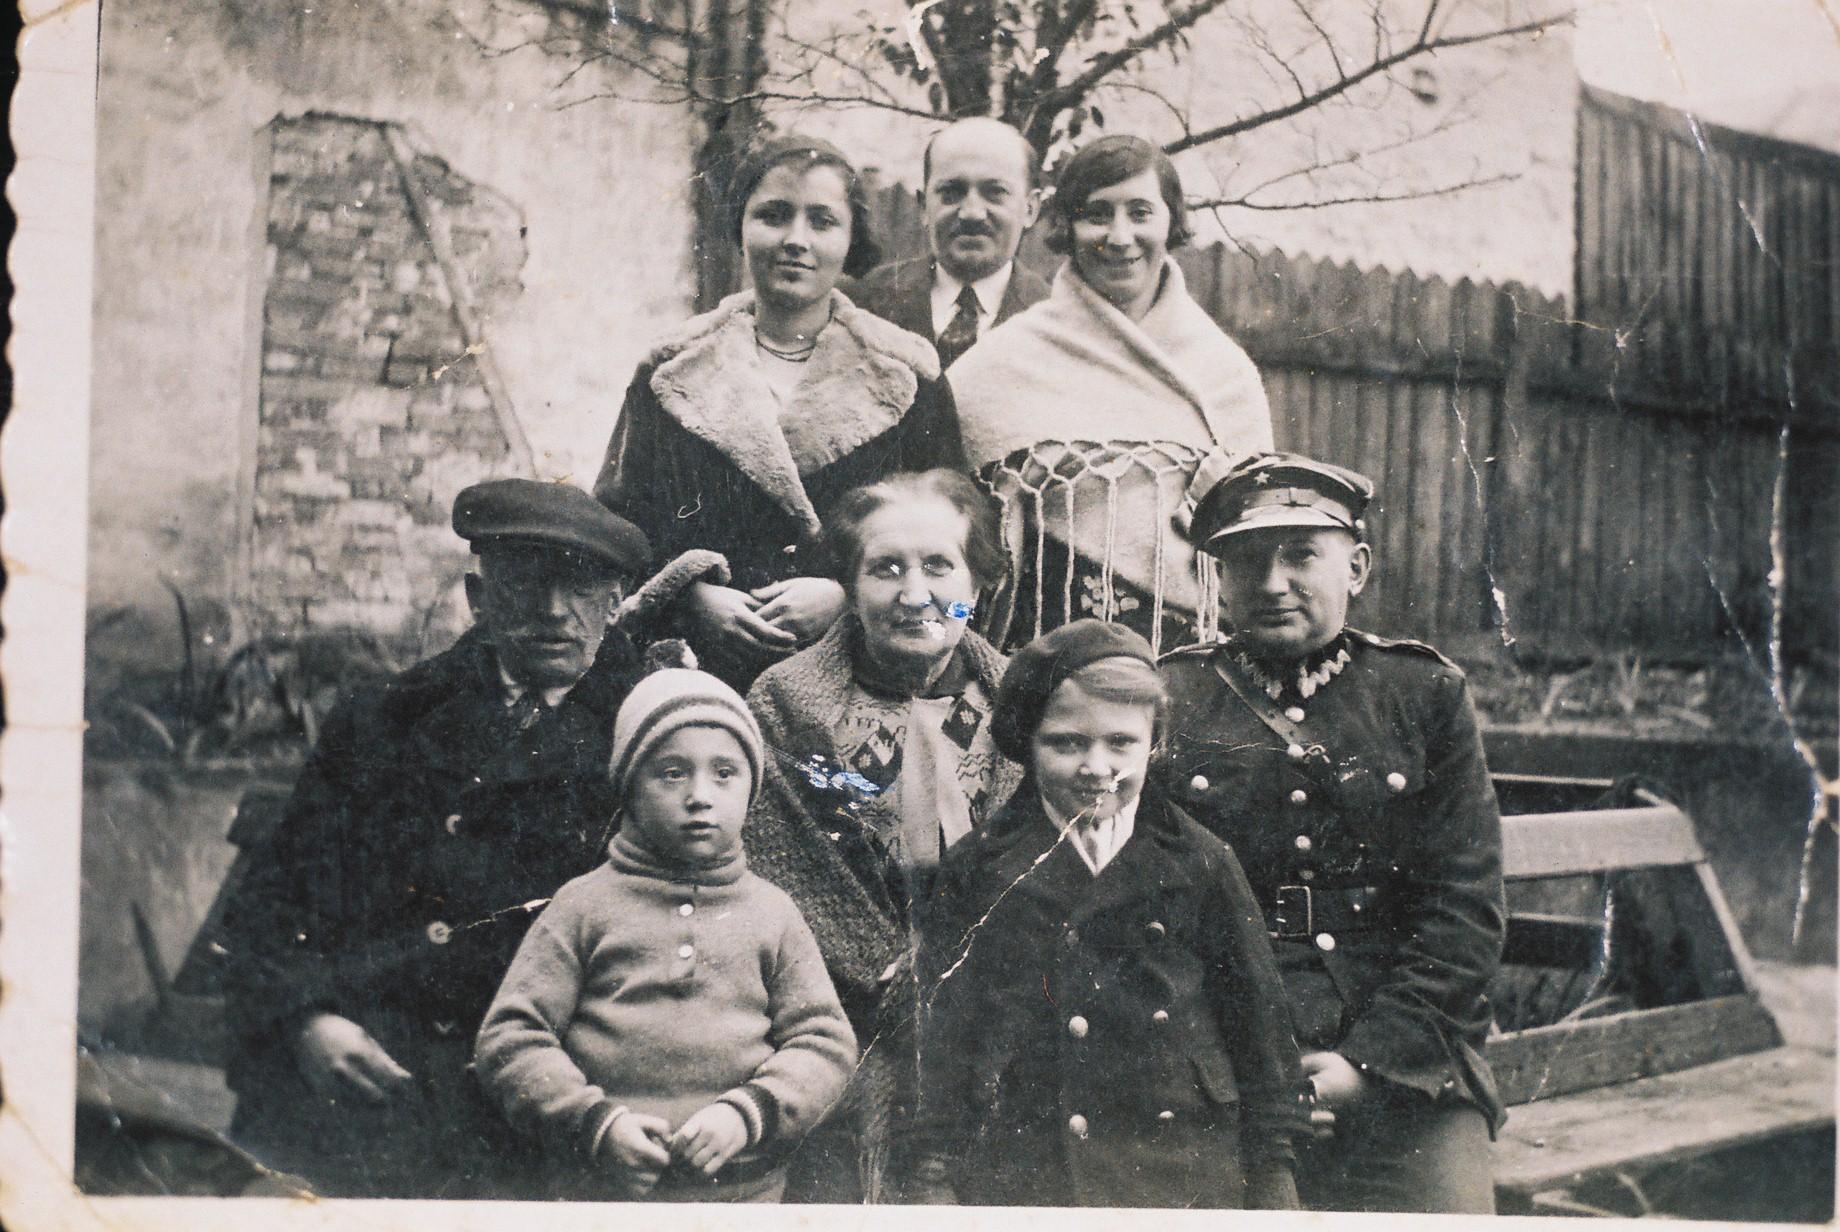 Seeking Kin Providing An Alternate Family For Holocaust